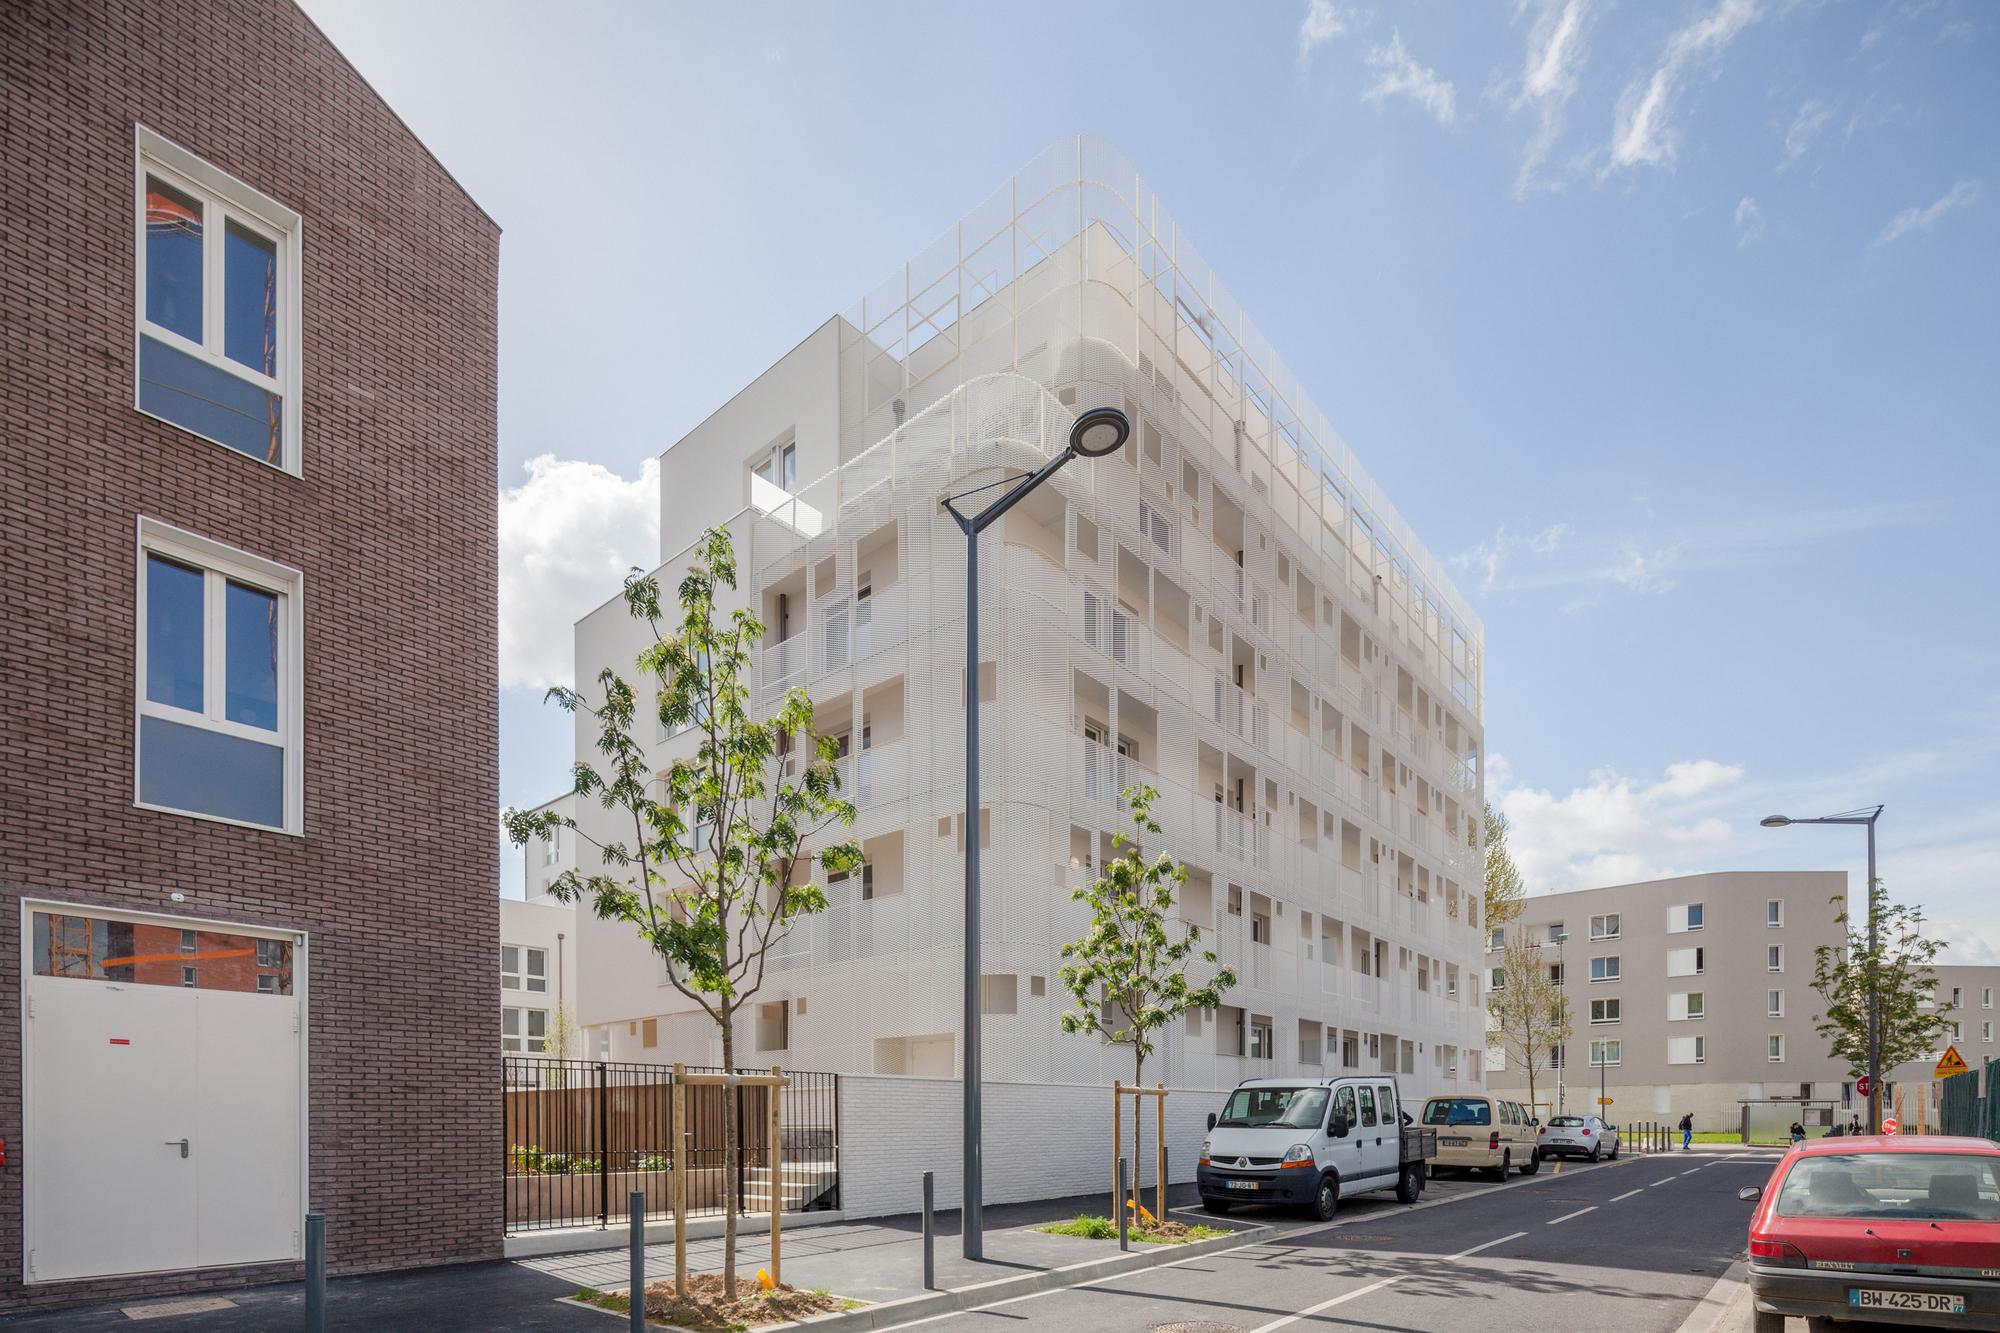 gallery of vigneux sur seine housing margot duclot architectes associ s 1. Black Bedroom Furniture Sets. Home Design Ideas